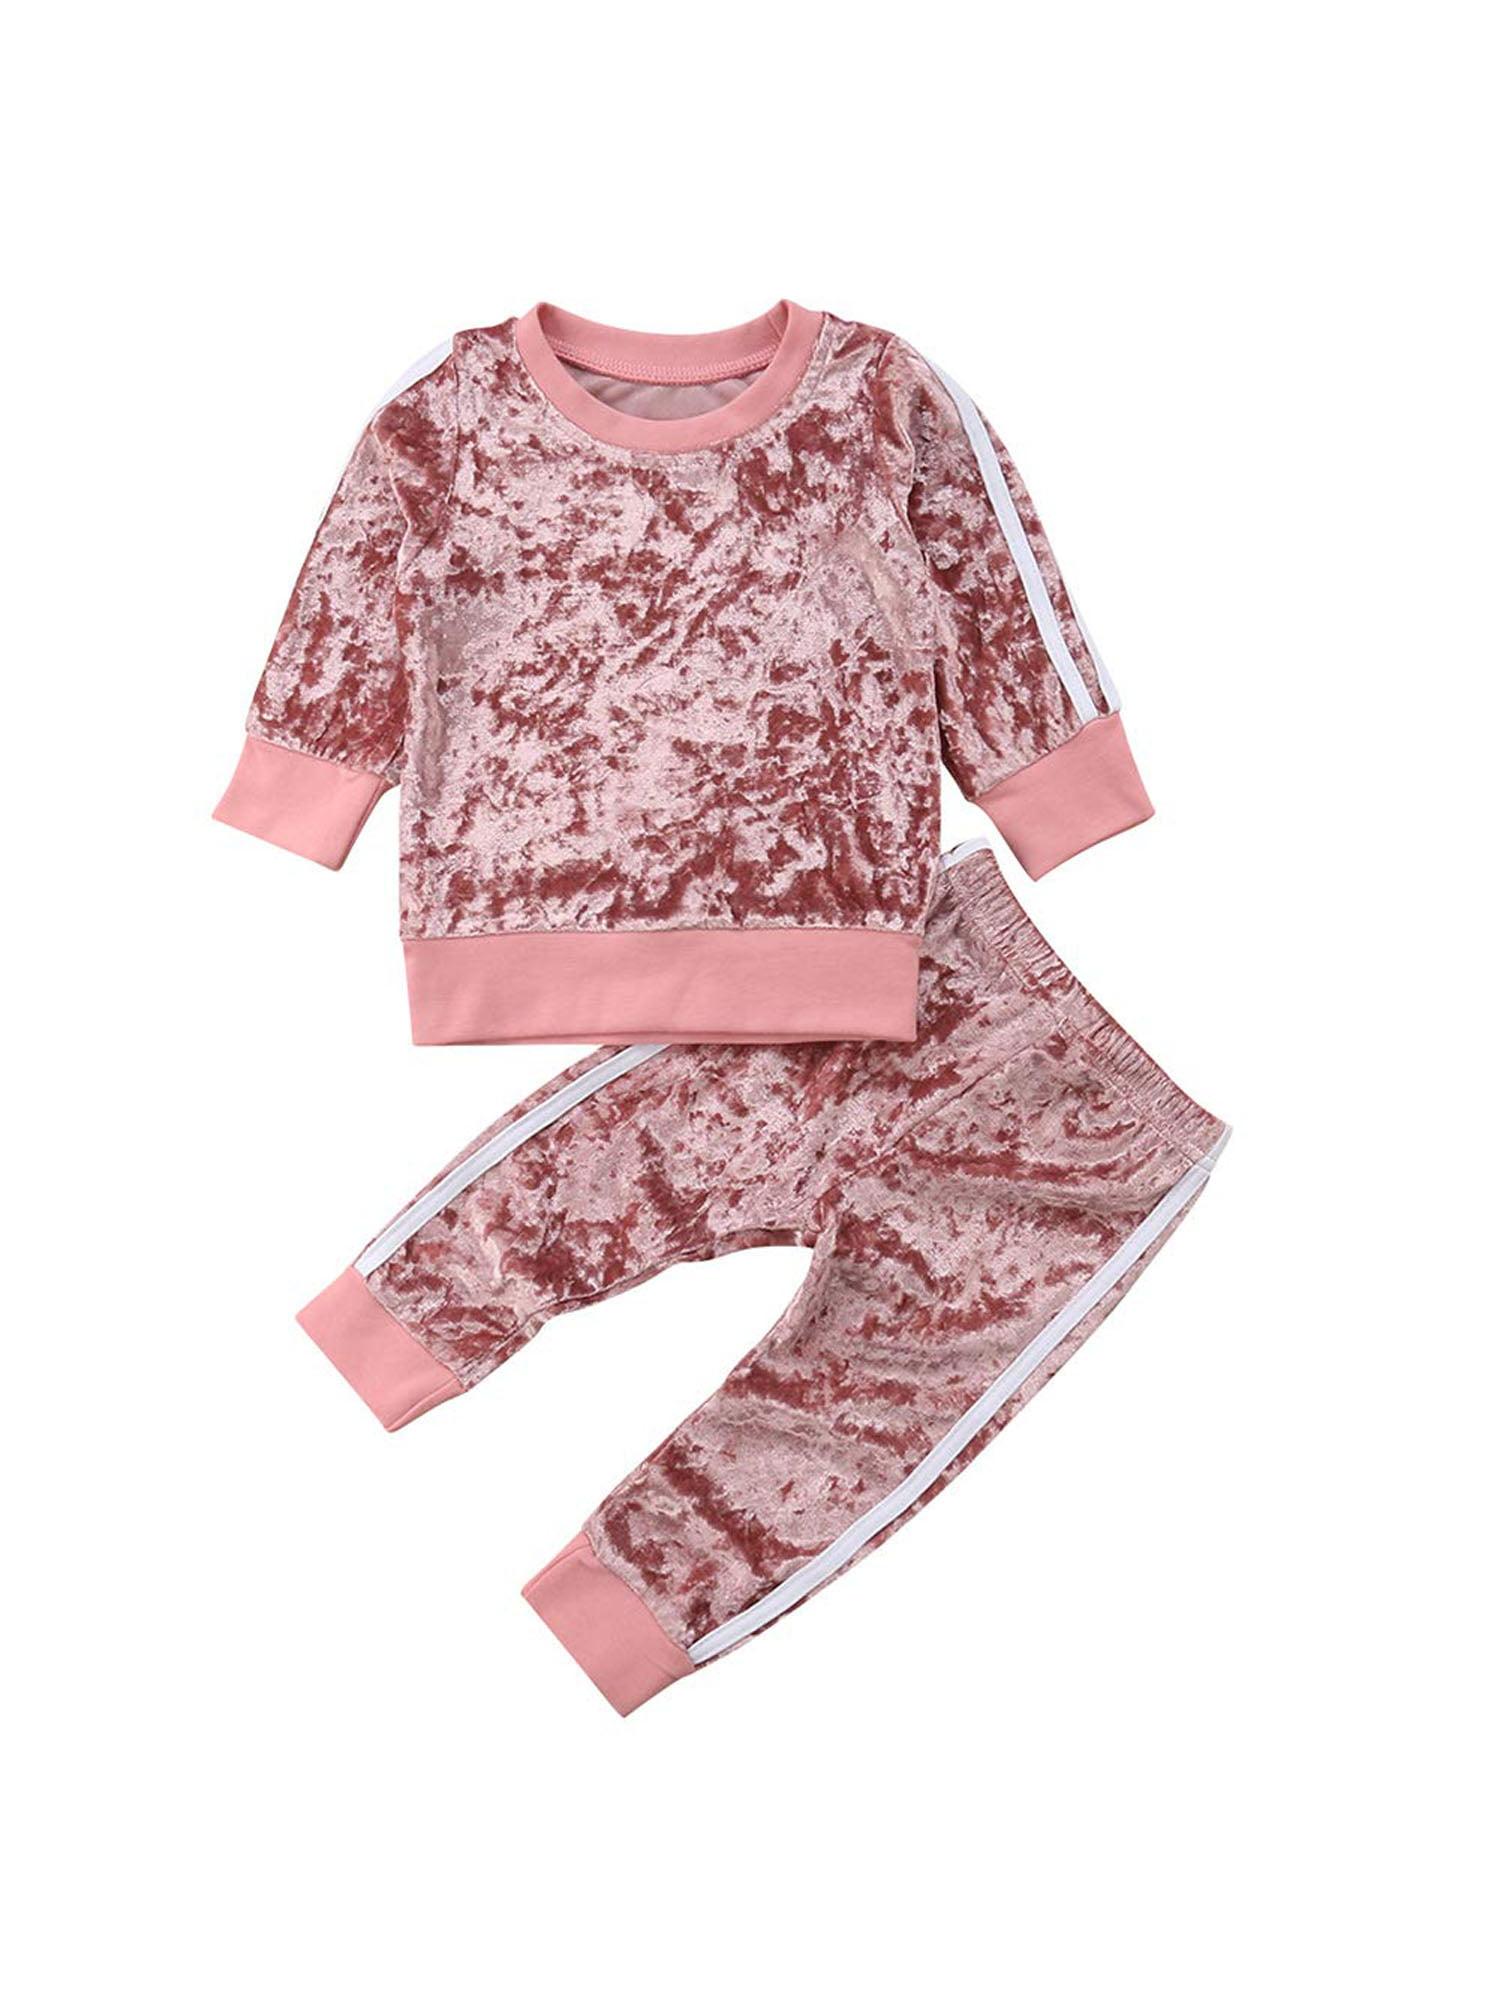 Suanret Suanret Kids Baby Girls Winter Warm Velvet Tops Pants Leggings Casual Outfits Walmart Com Walmart Com